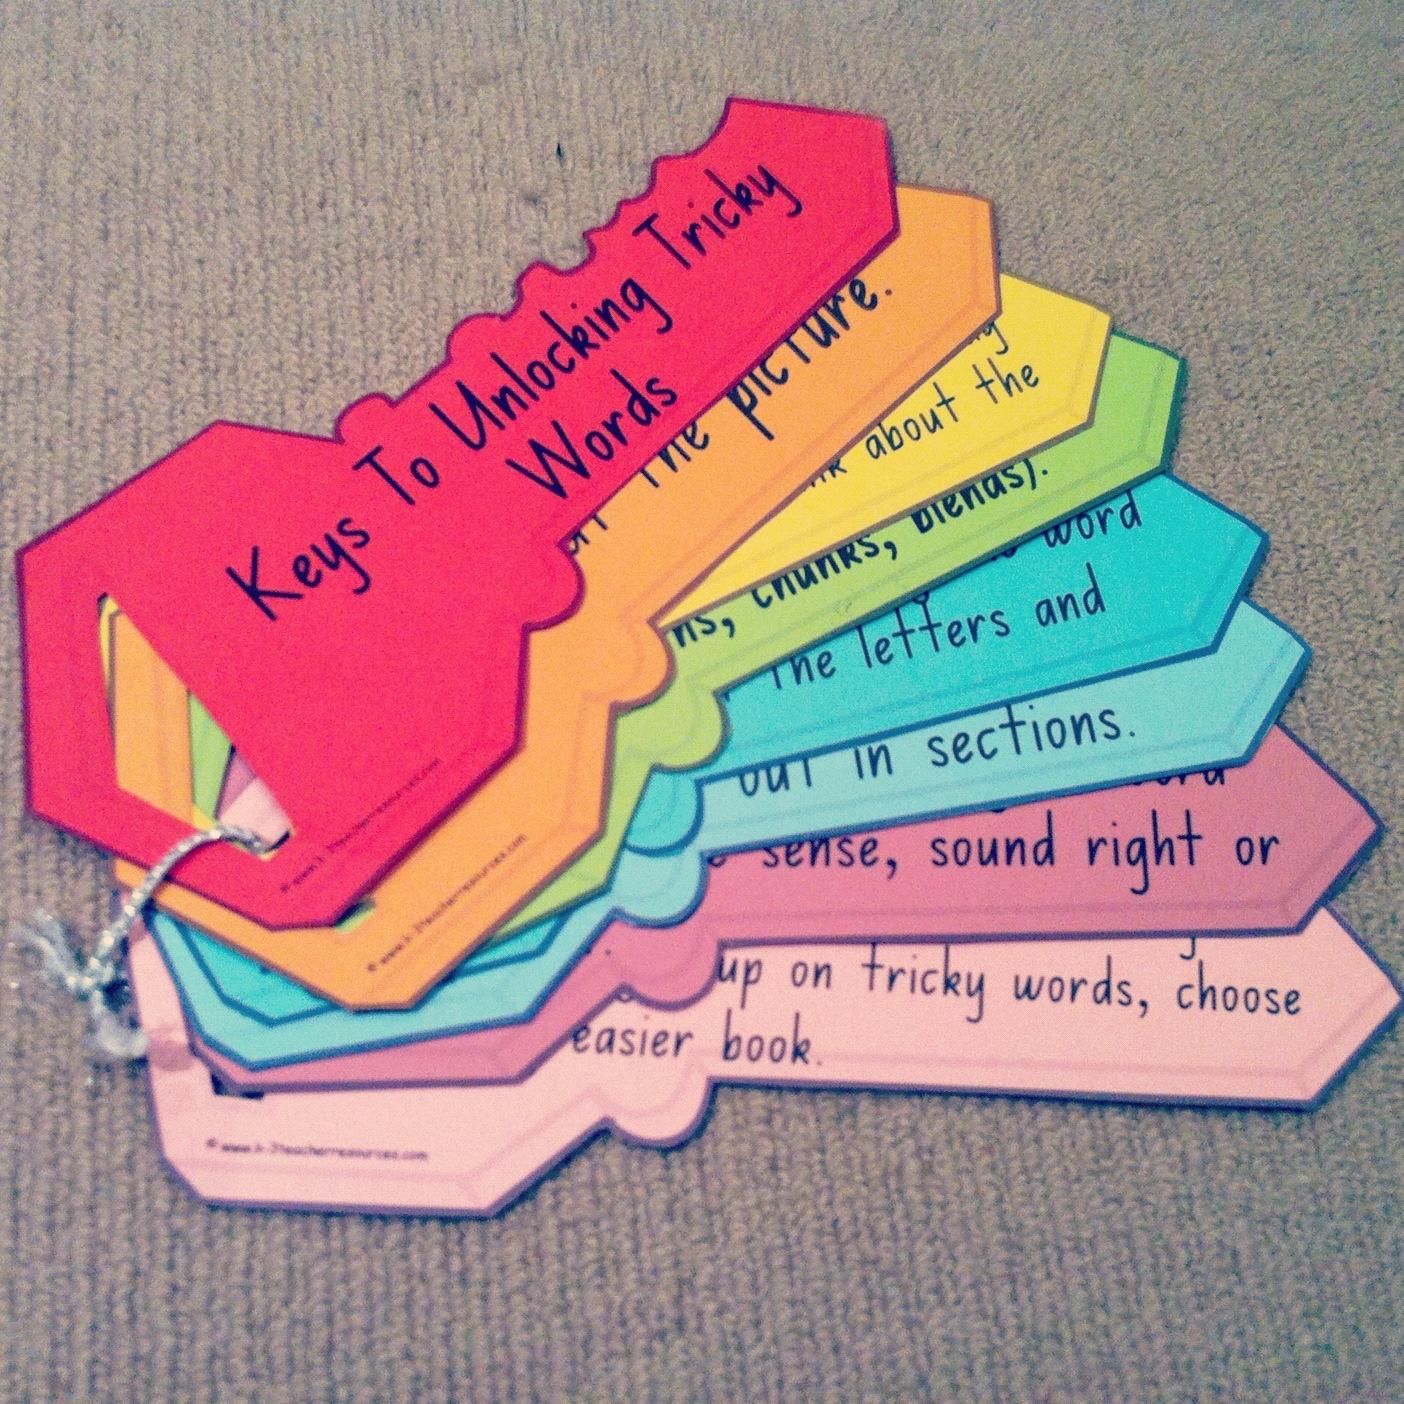 Keys To Unlocking Tricky Words